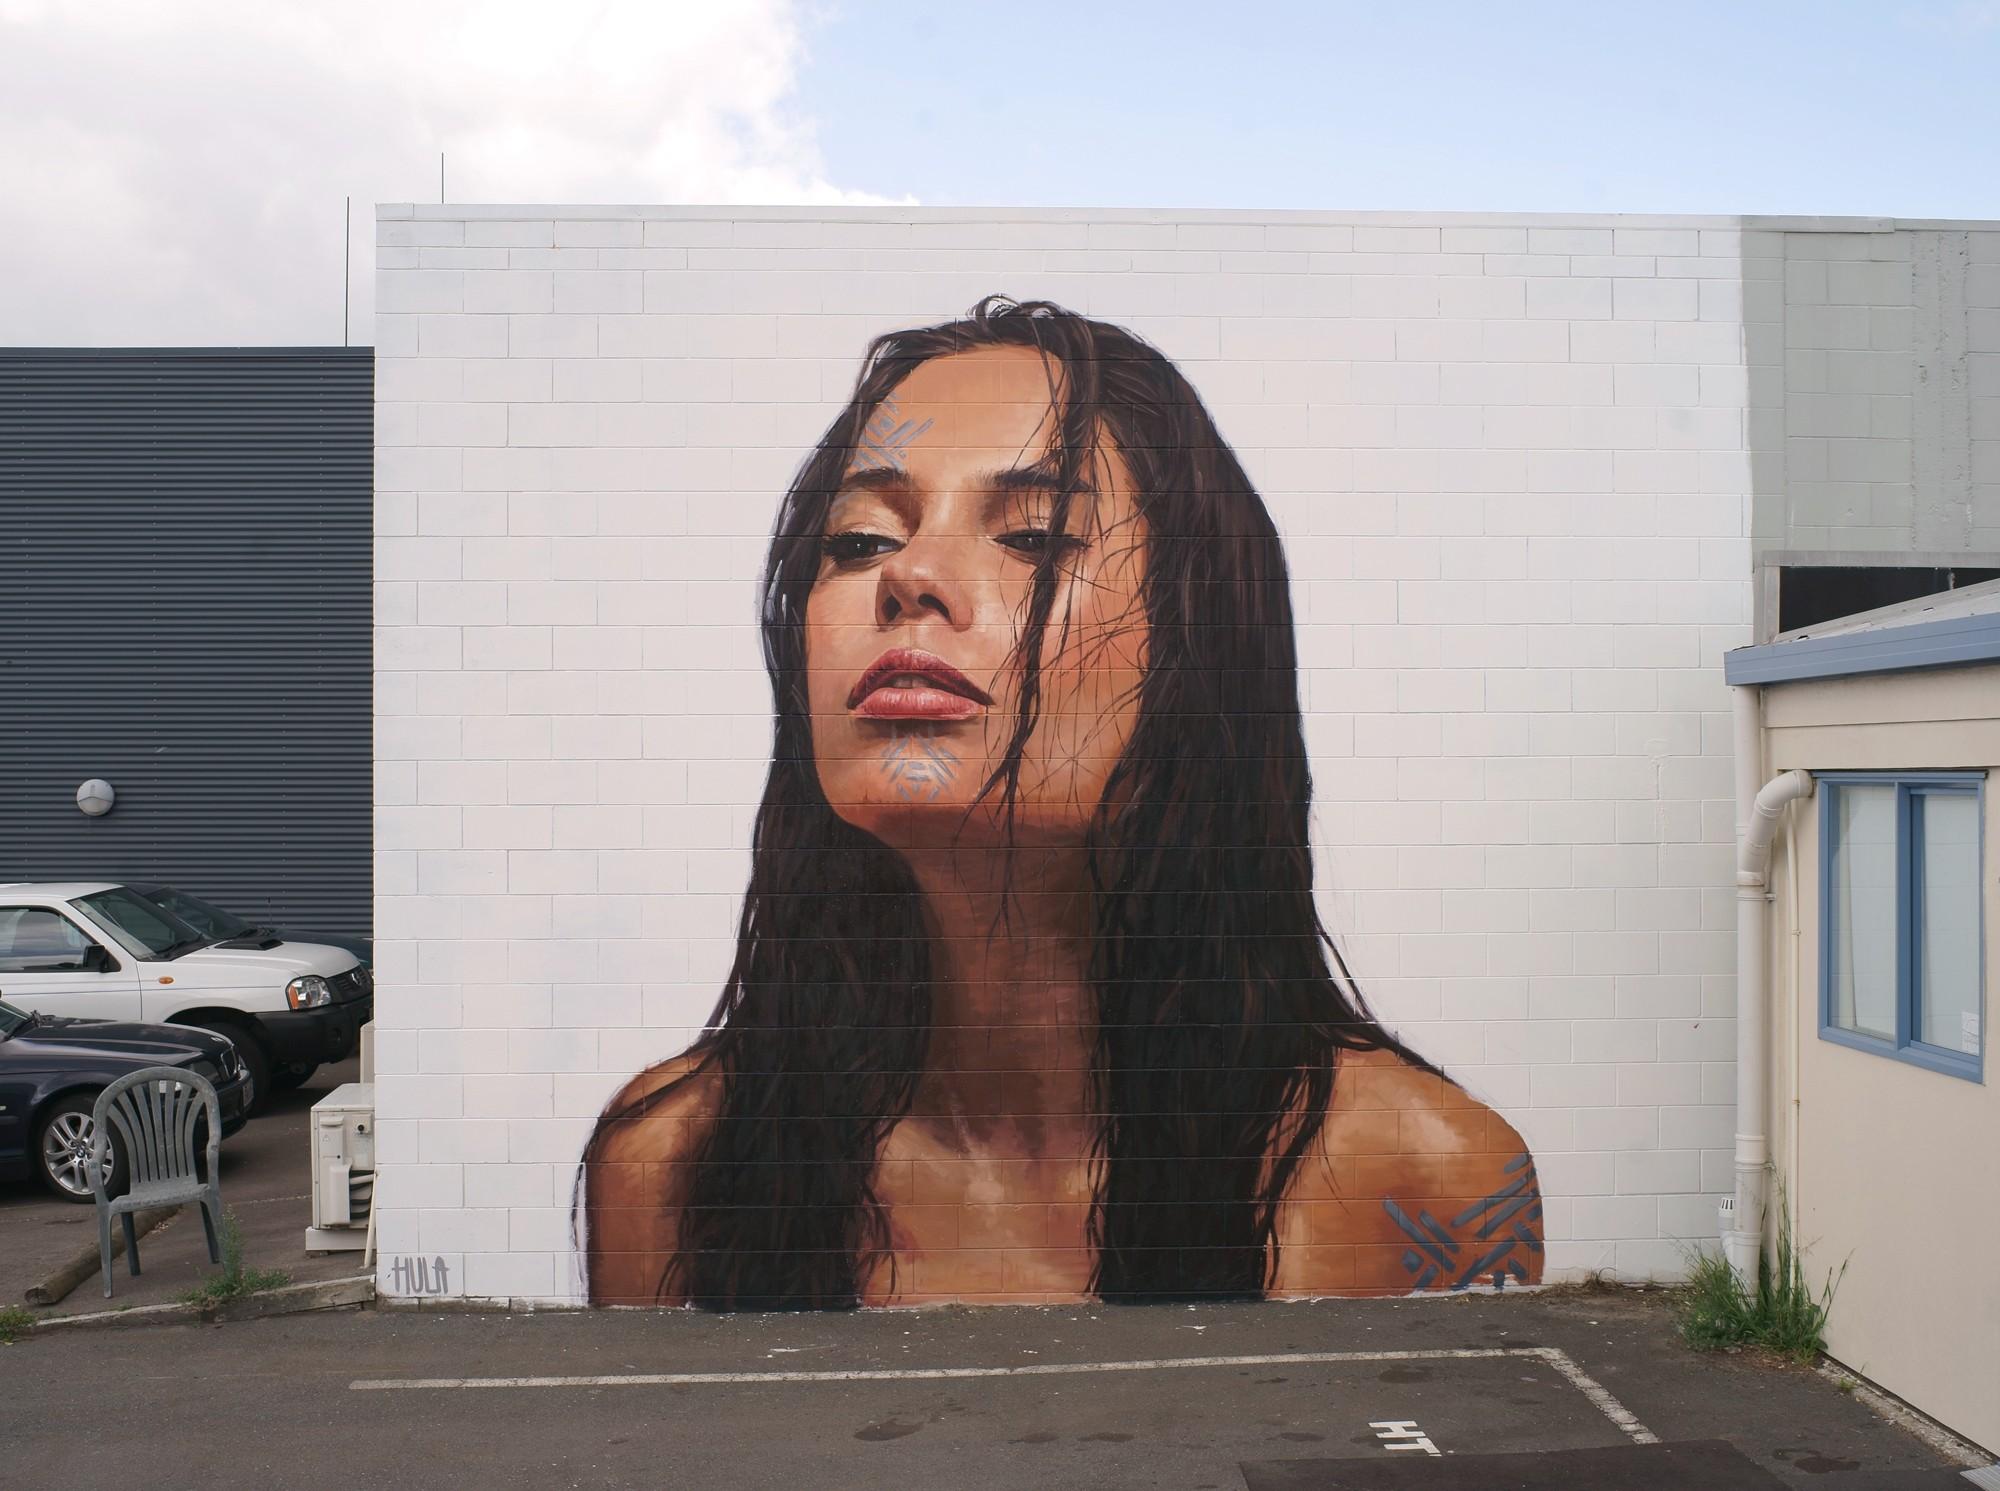 NZ1-low